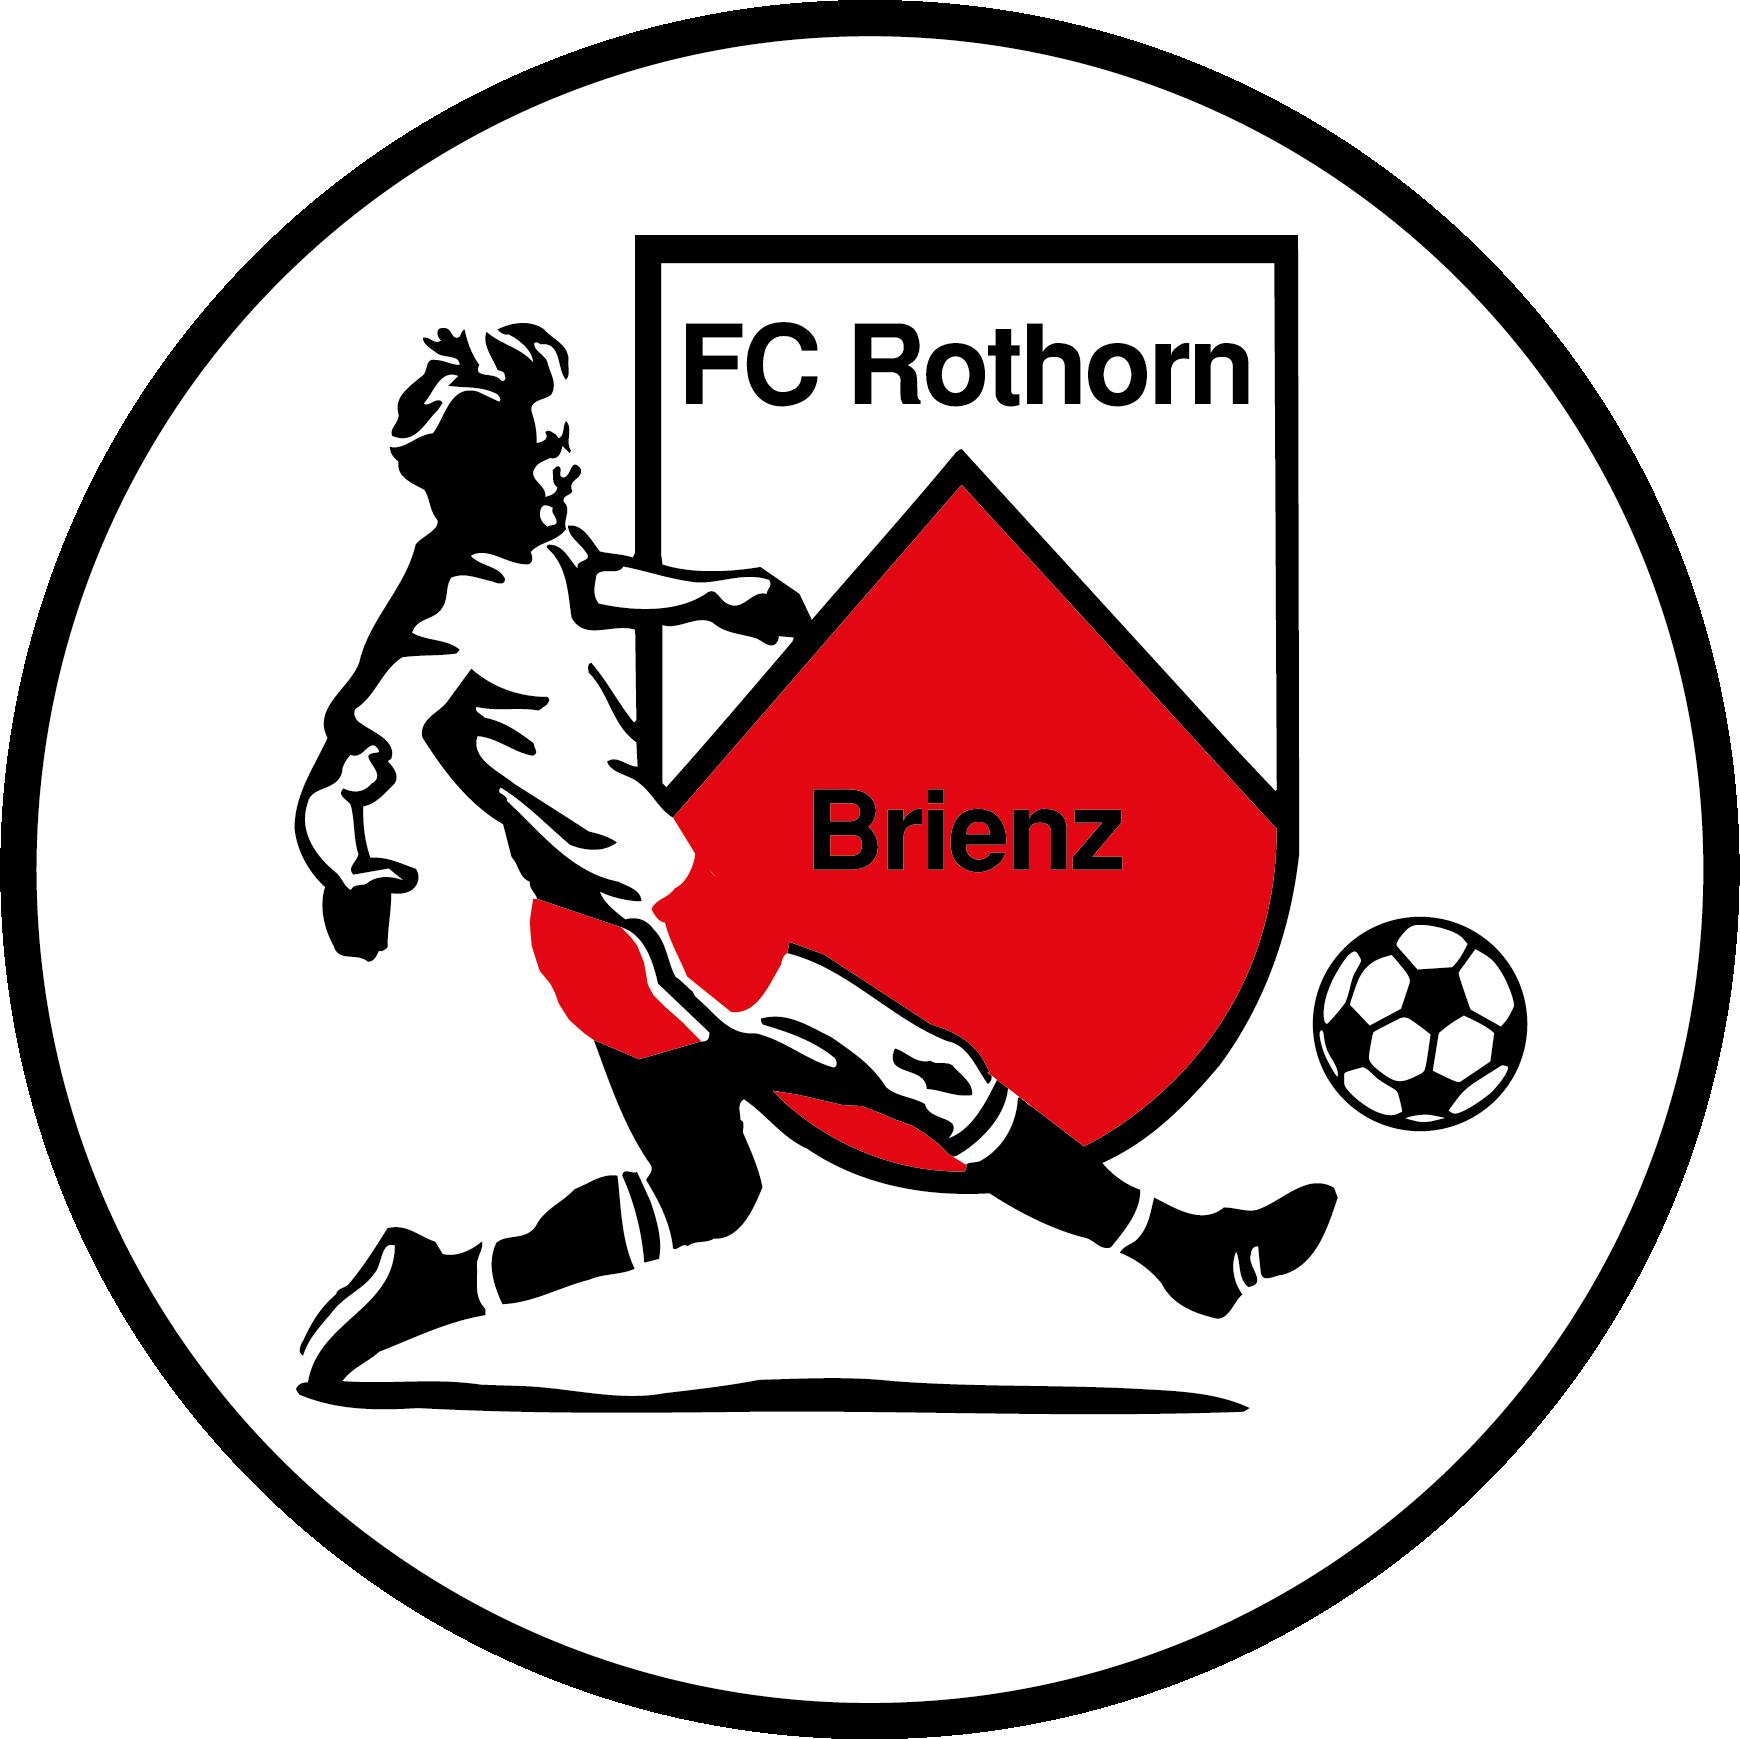 FC Rothorn